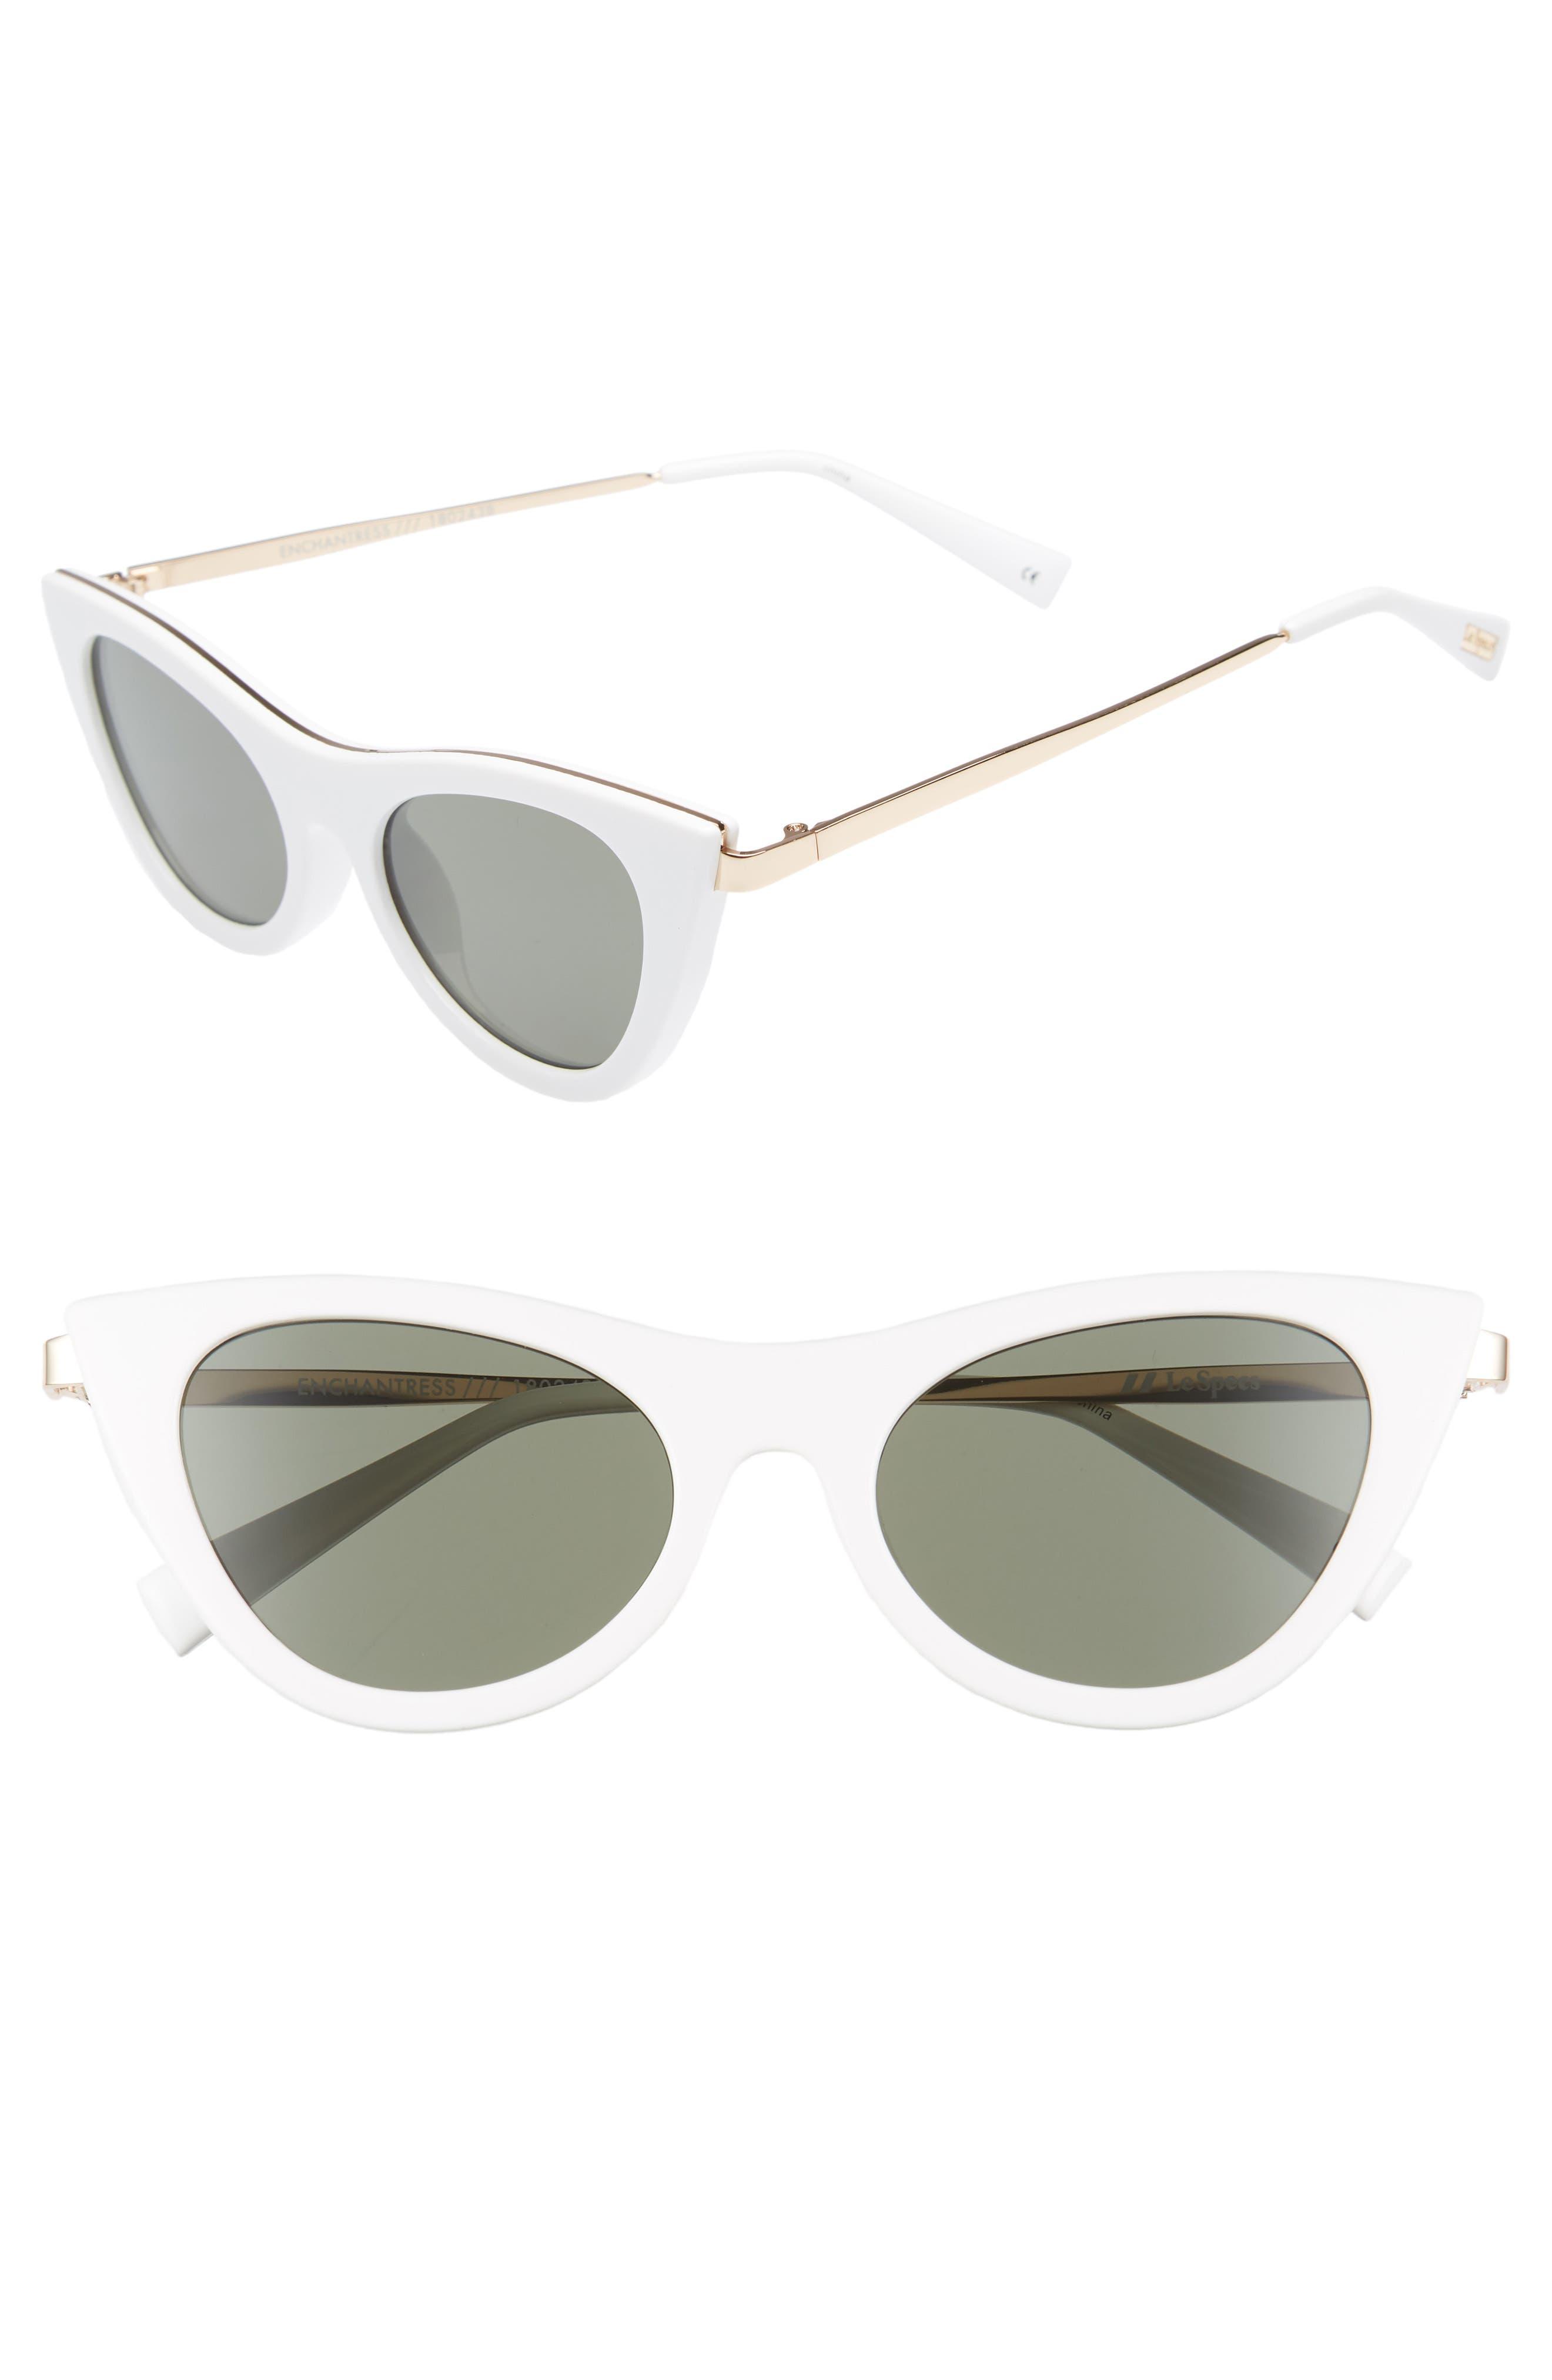 Enchantress 50mm Cat Eye Sunglasses,                             Main thumbnail 1, color,                             White